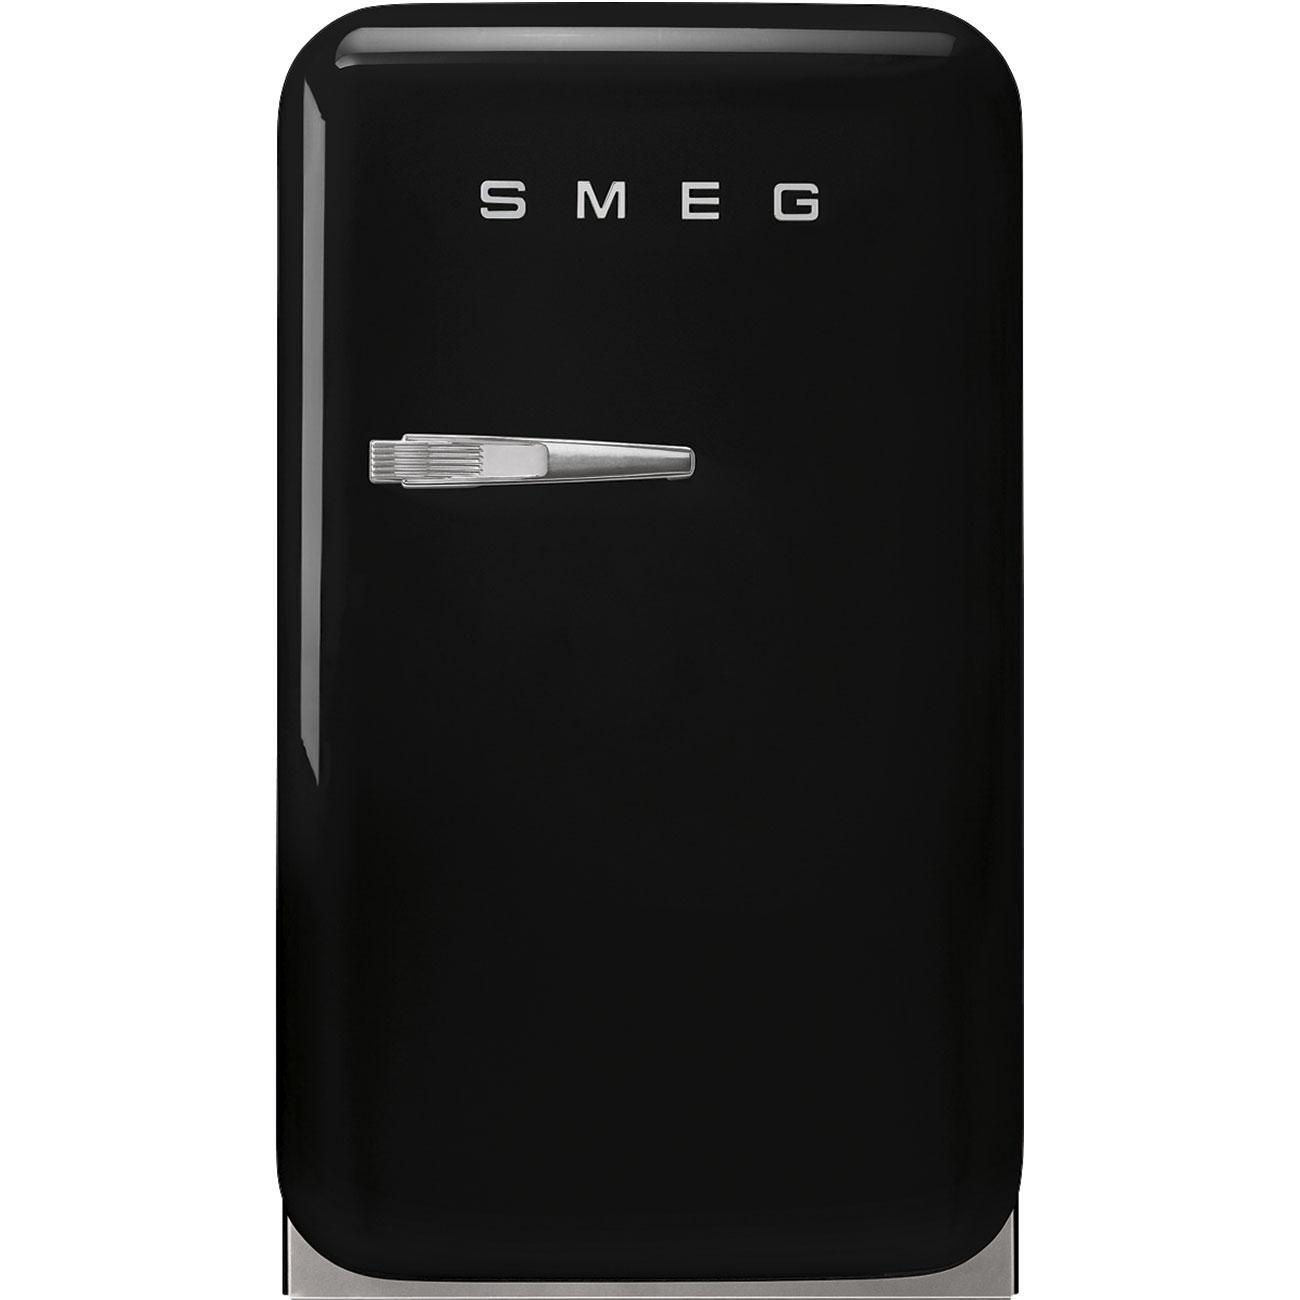 SmegRetro-Style Mini Refrigerator, Right-Hand Hinge, Black